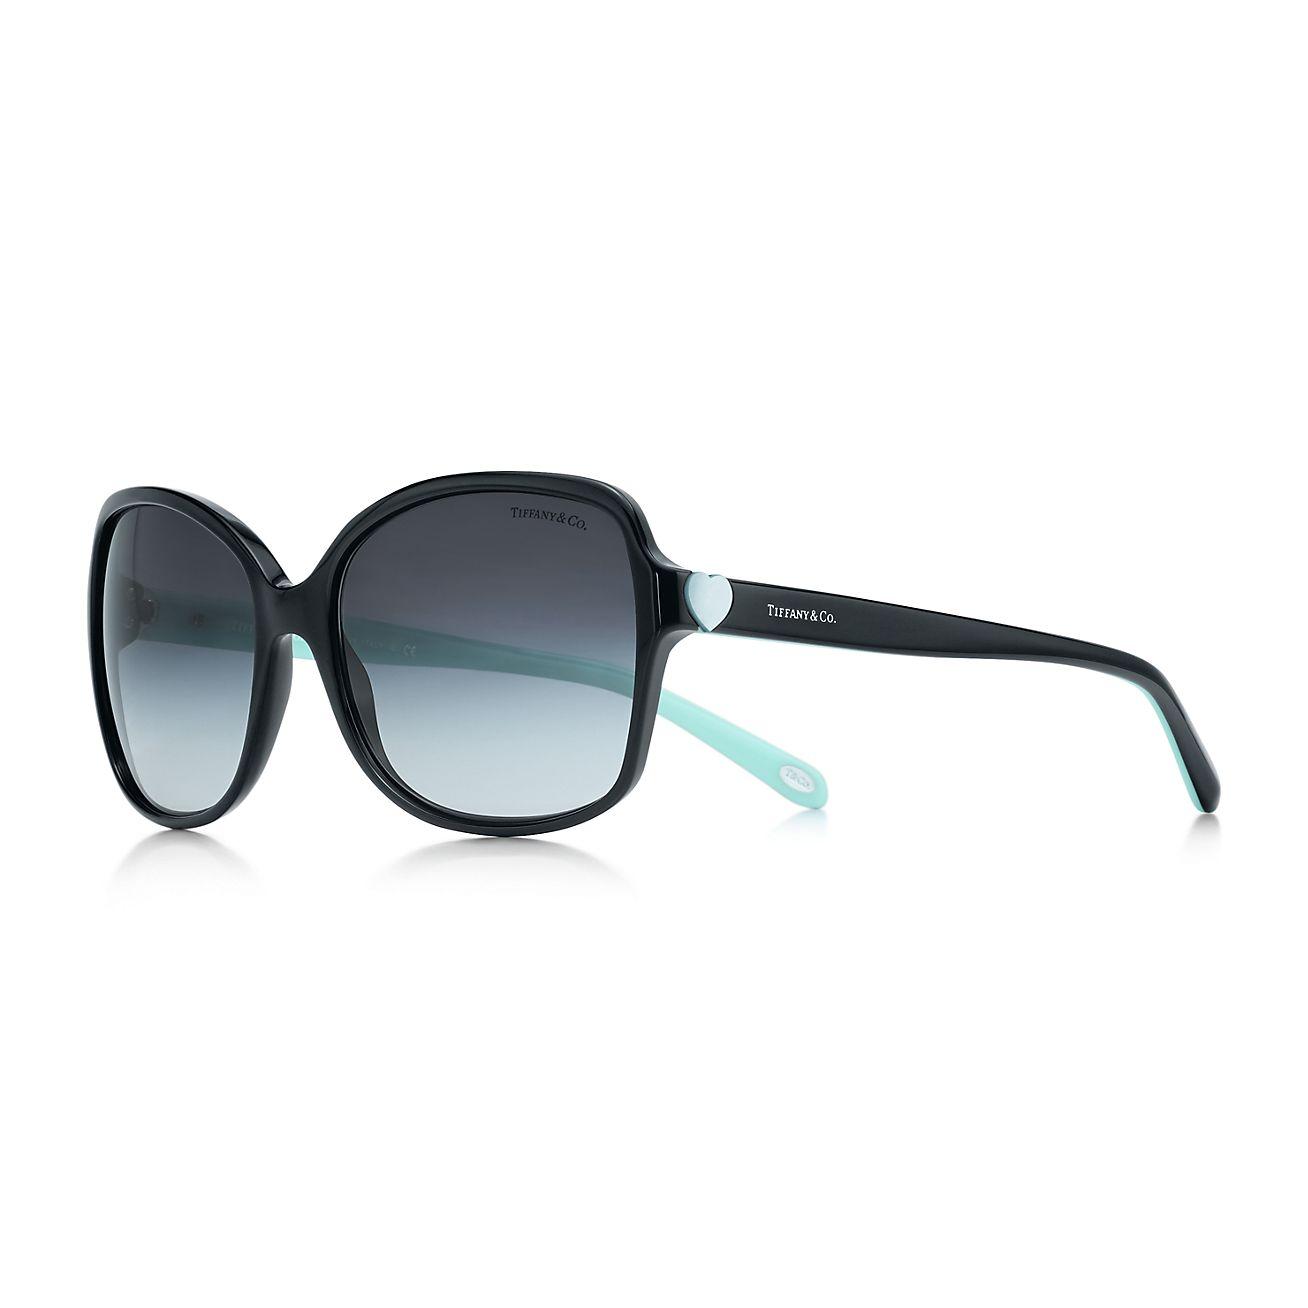 Tiffany Hearts™ square sunglasses in black and Tiffany ...